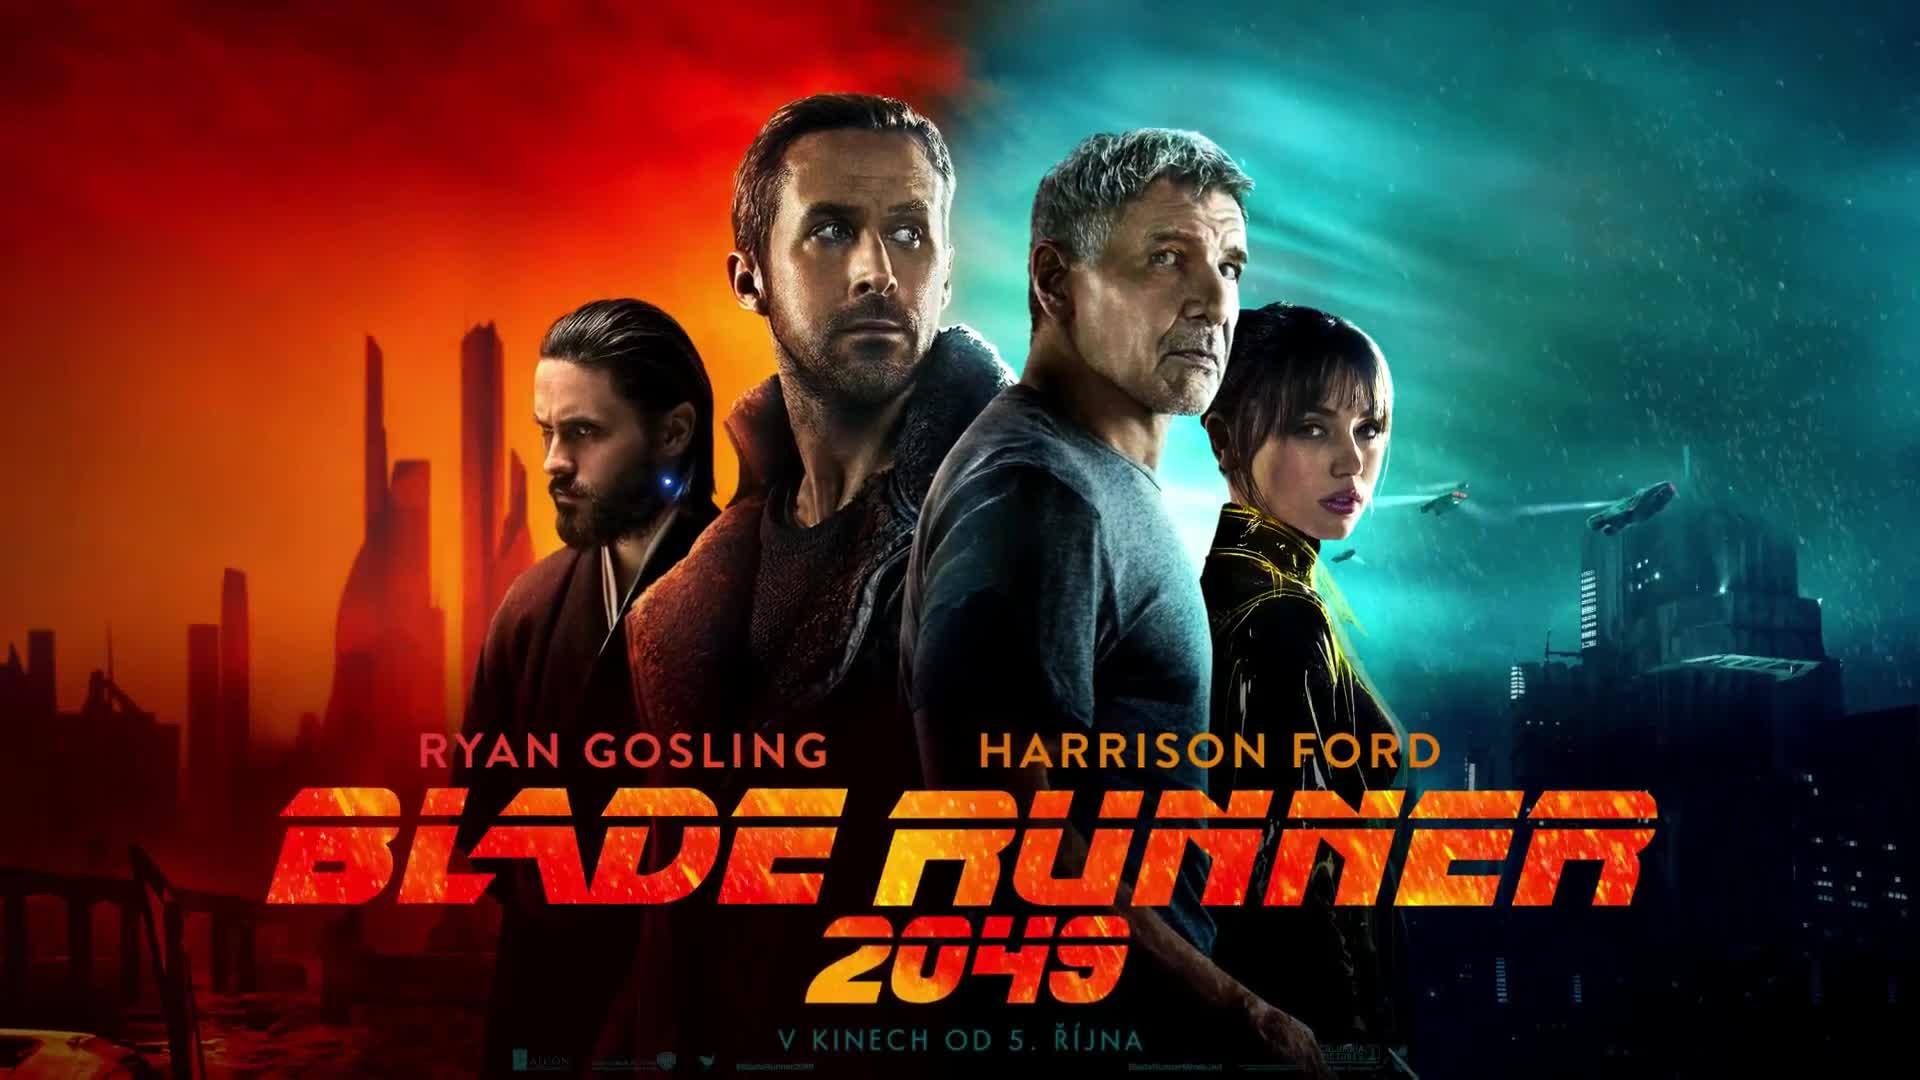 blade runner 2049 prequel film 2048 niet niku kr tky film sector. Black Bedroom Furniture Sets. Home Design Ideas